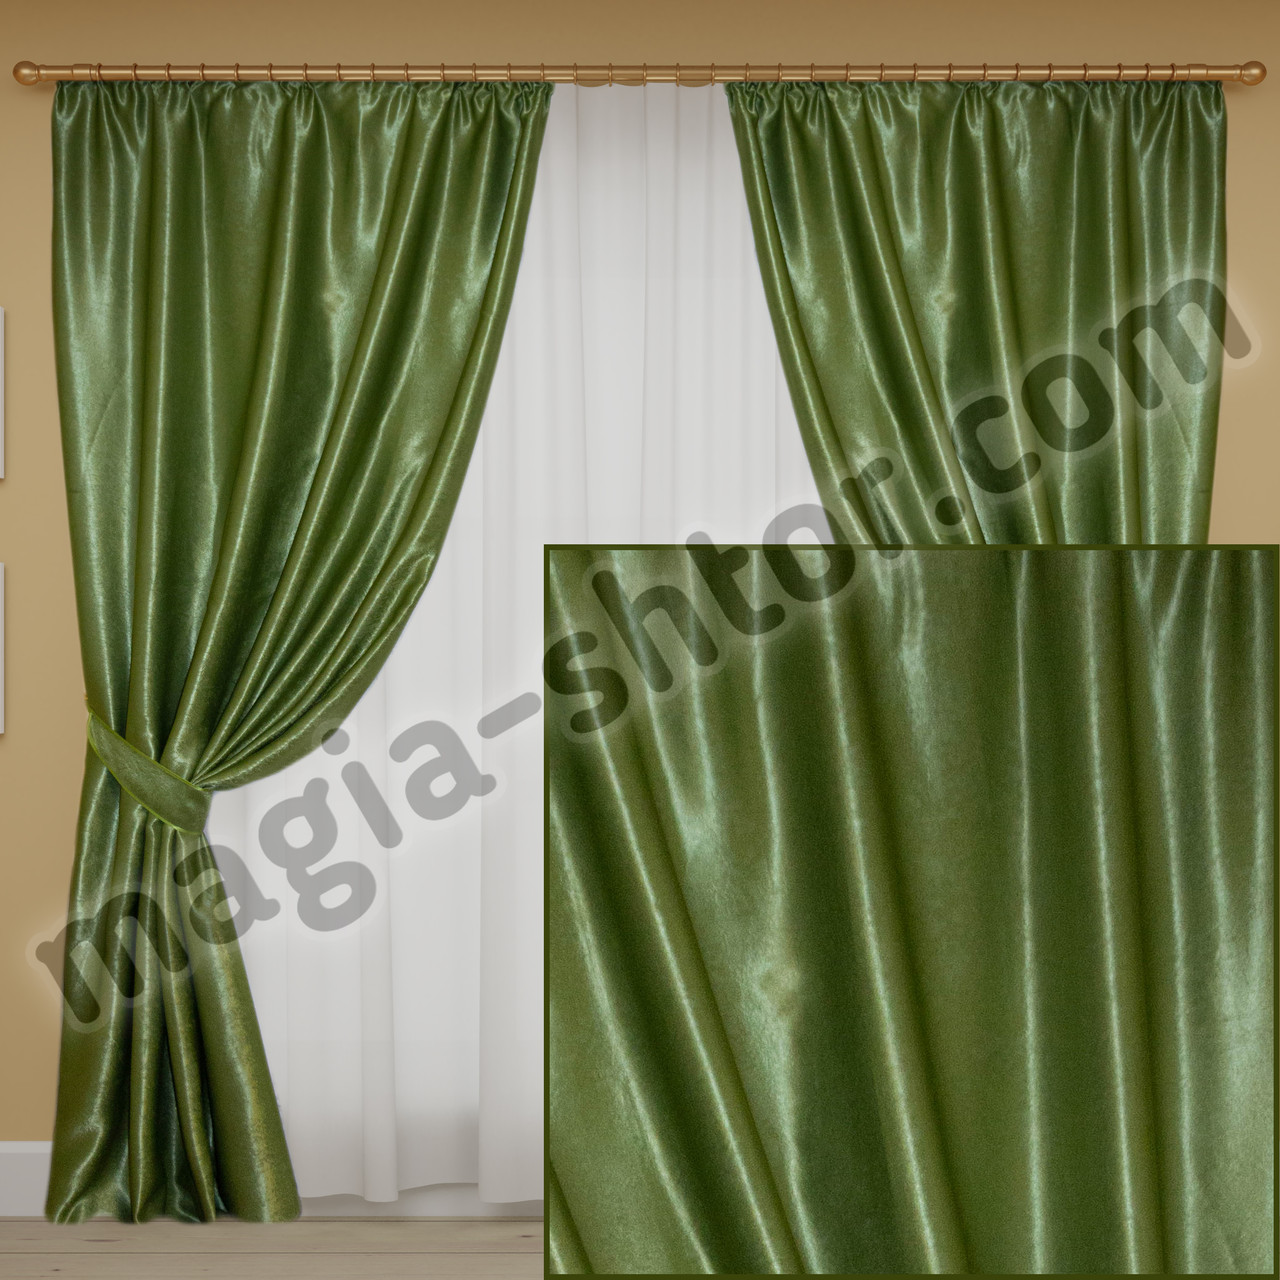 Готовые шторы блэкаут. Цена за 2 портьеры с подхватами